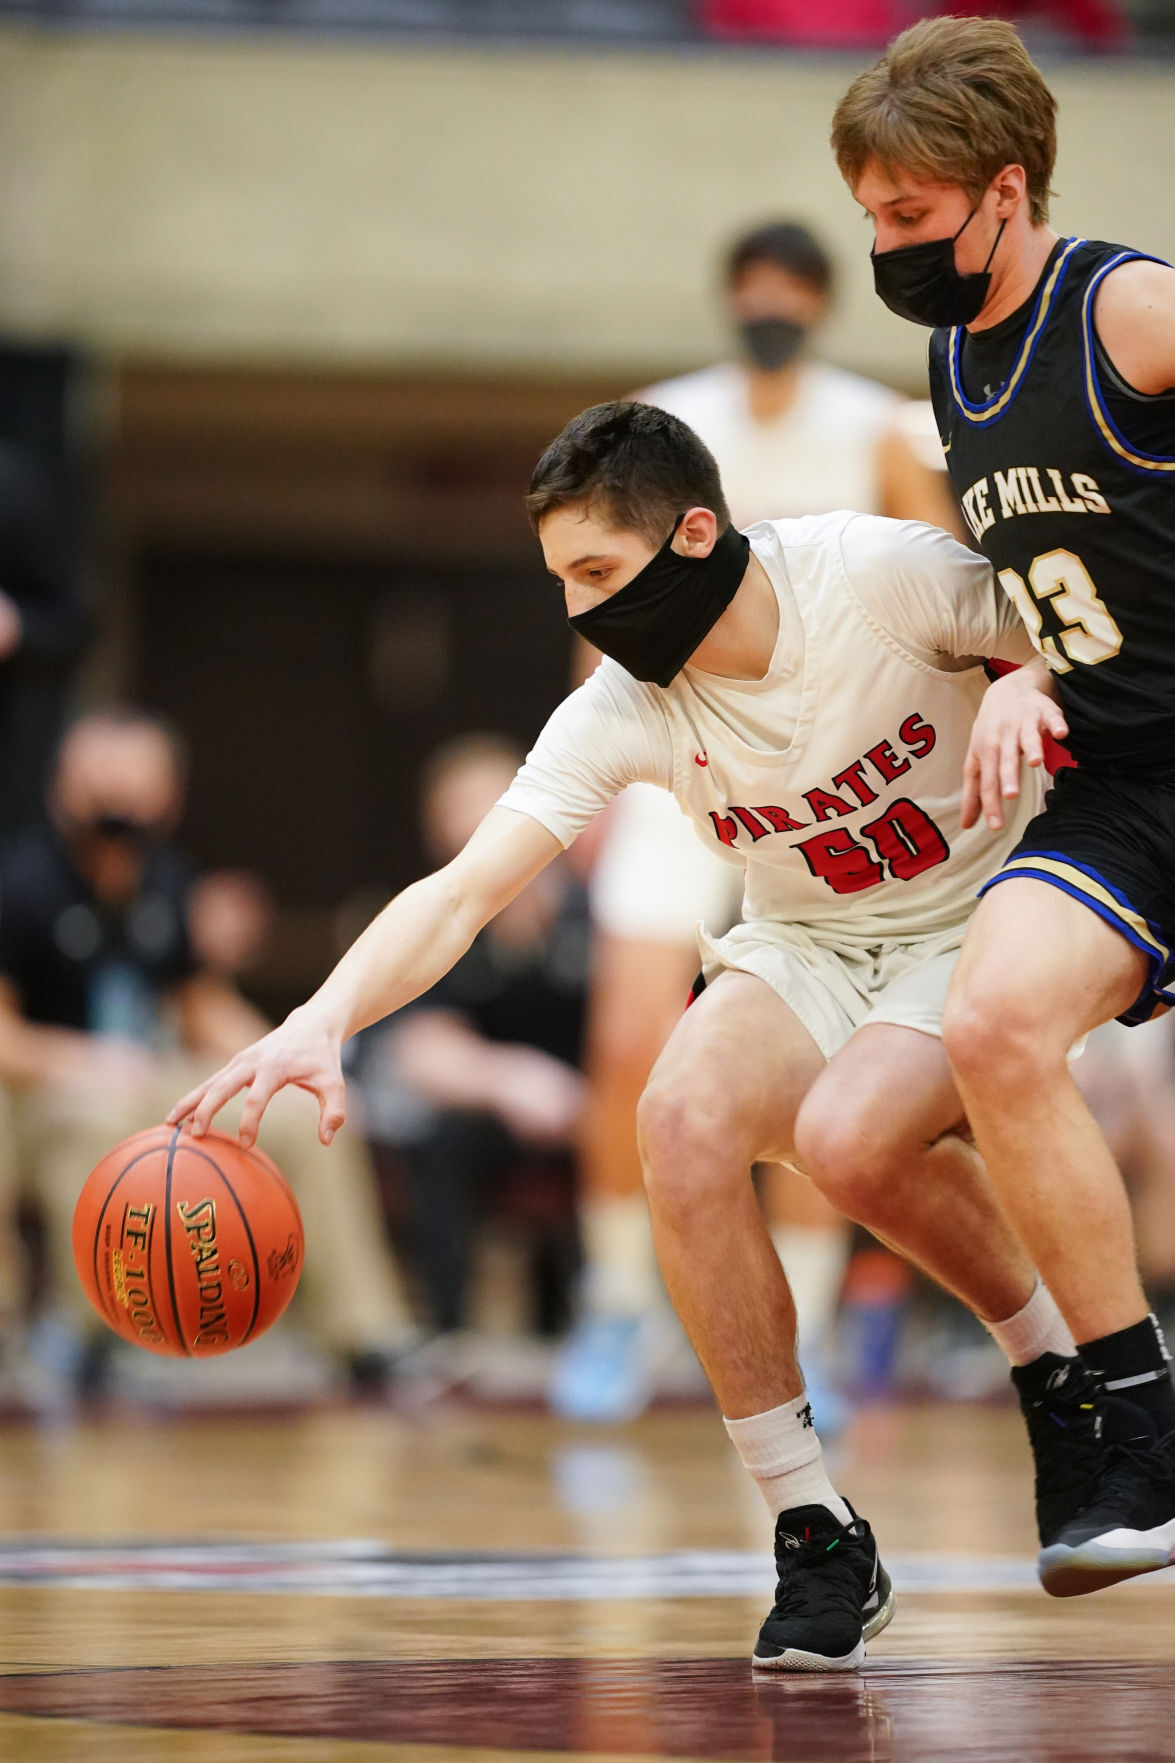 WIAA boys basketball photo: Lake Mills Charlie Bender tries to bump the ball away from Pewaukee's Nick Janowski